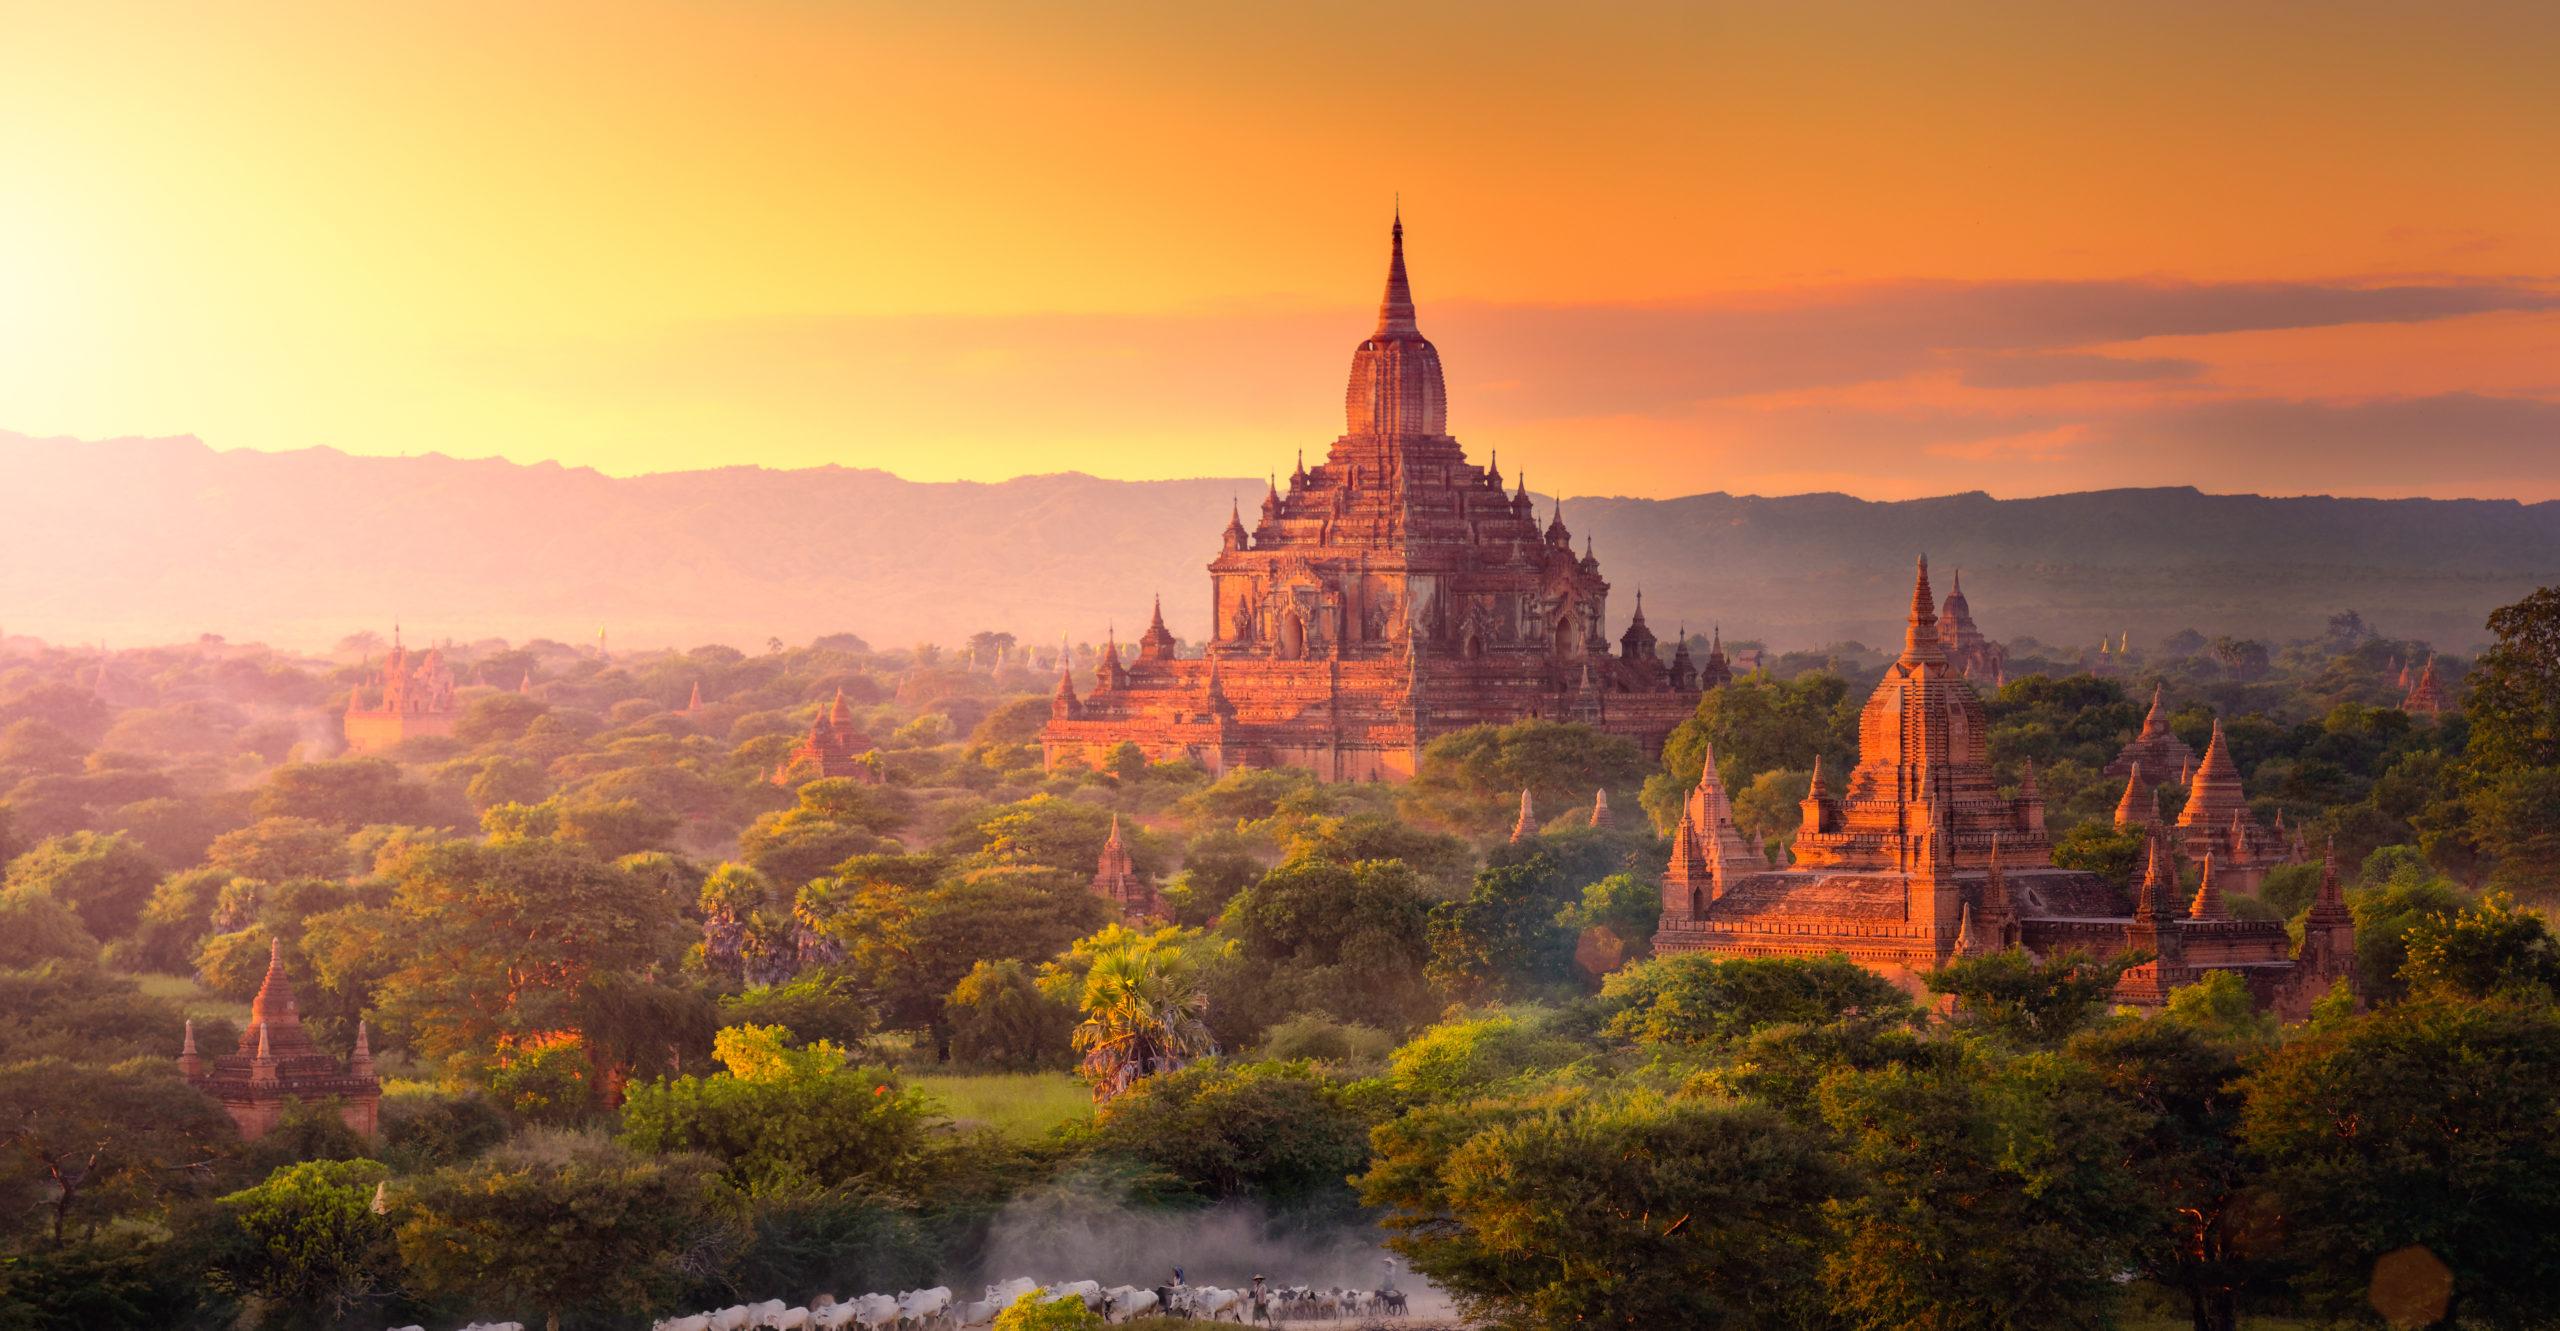 Burma [Shutterstock]